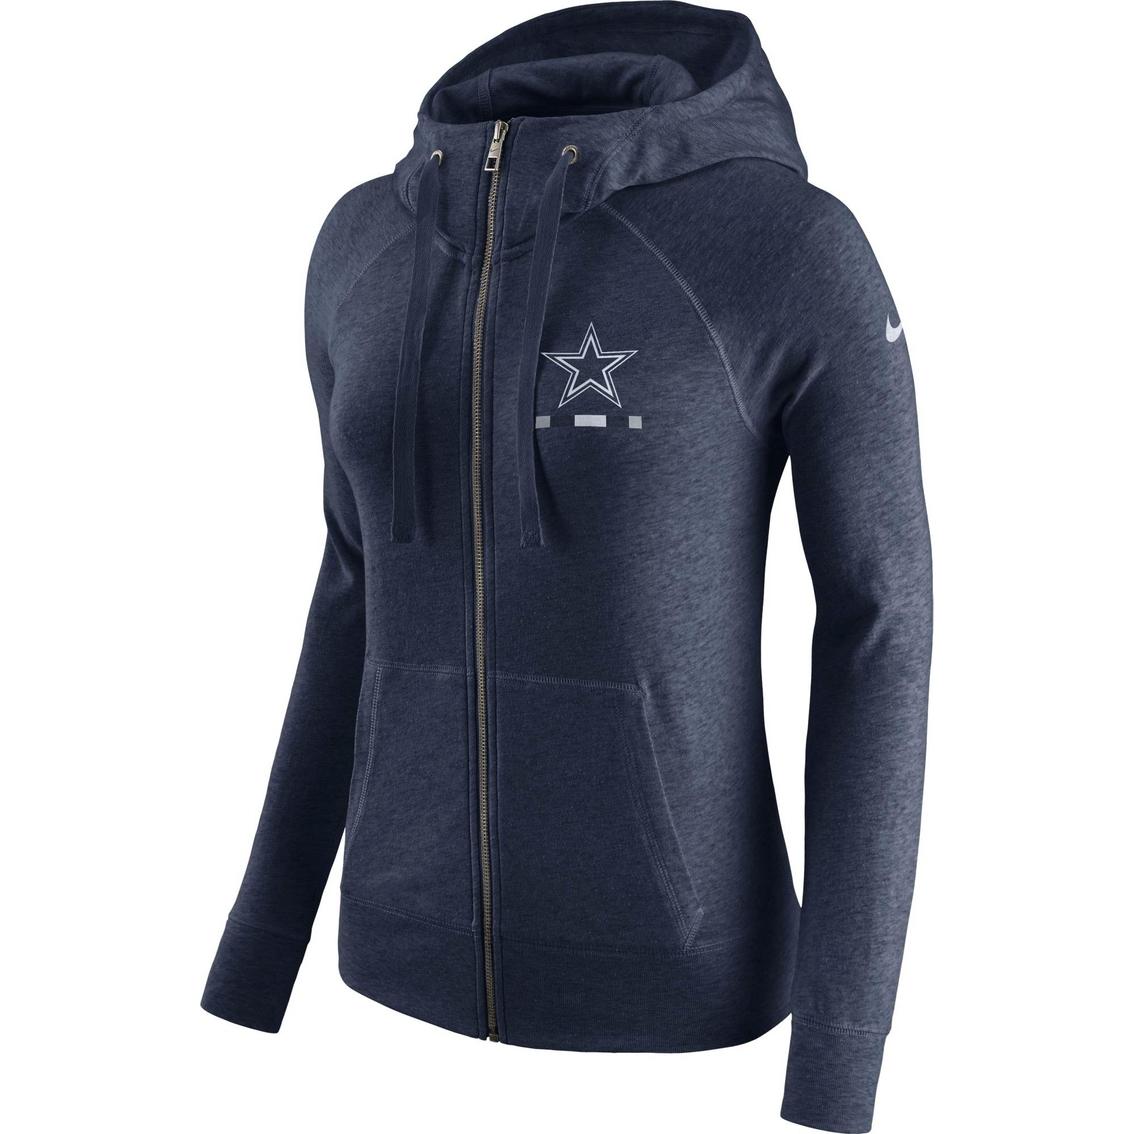 Nike Nfl Dallas Cowboys Women s Gym Vintage Hoodie  e3a1b8cff